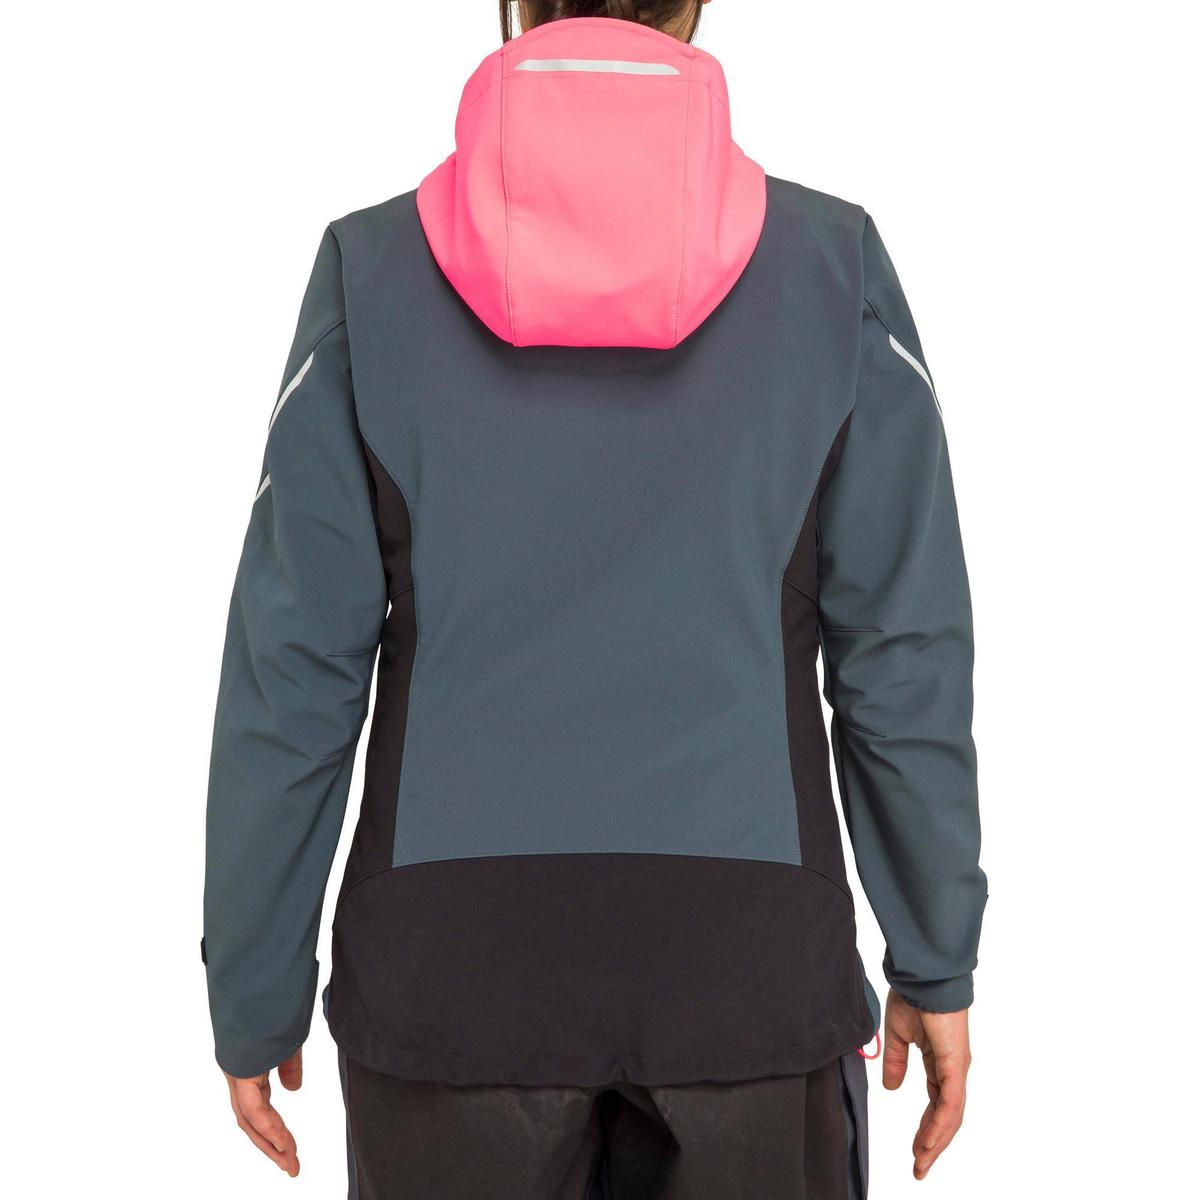 Bild 5 von Softshelljacke Segeln Race Damen grau/neonrosa